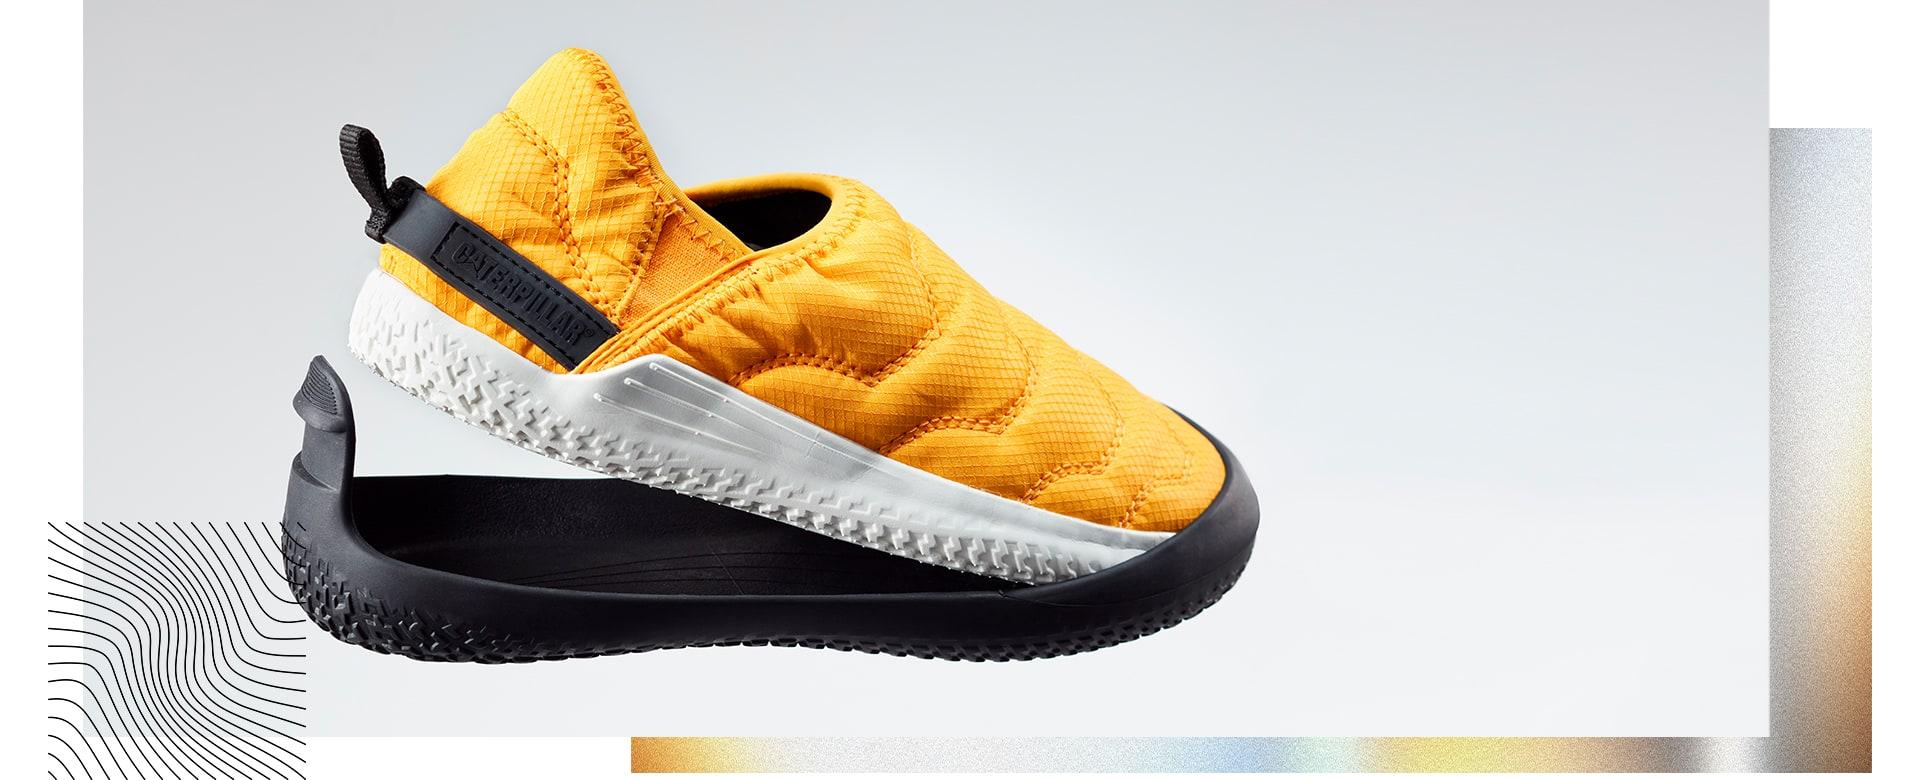 Cat Crossover shoe.